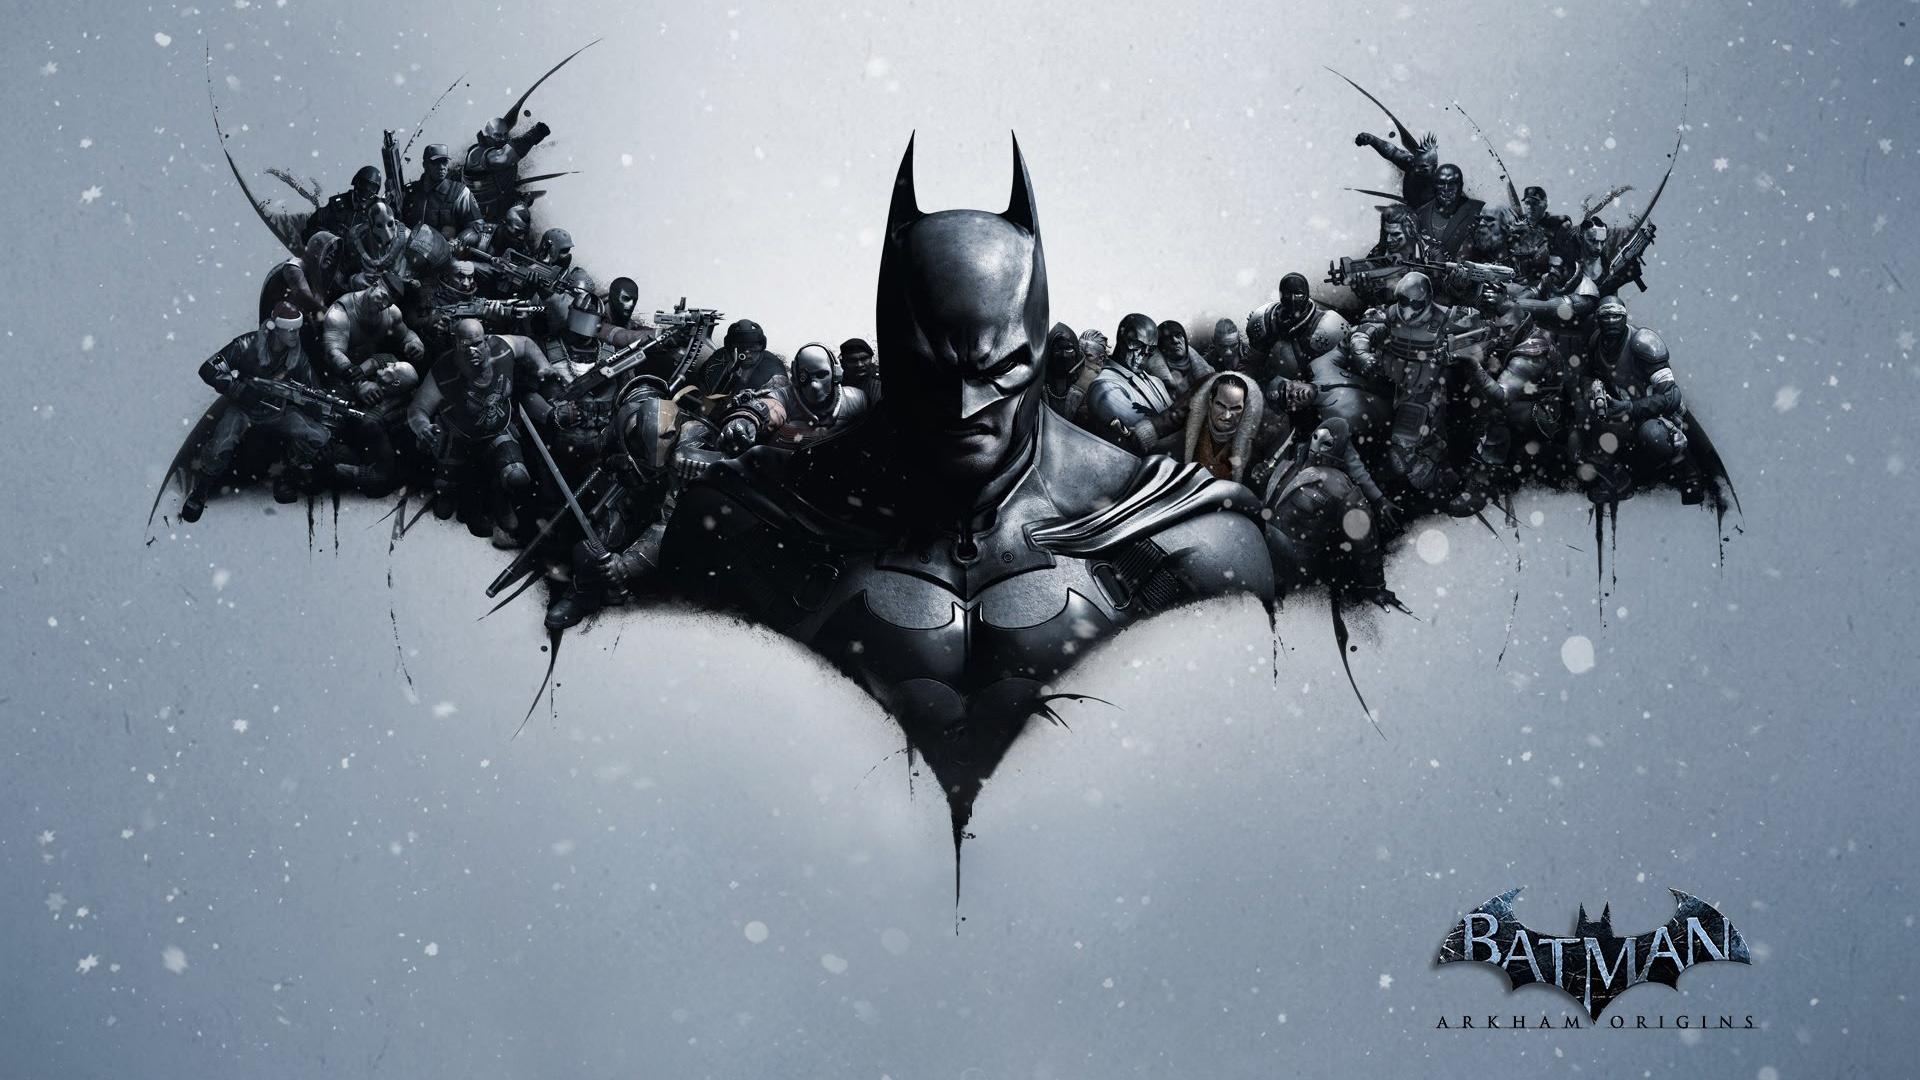 Batman-Arkham-Origins-HD-1920x1080px-Game-HD-wallpaper-wp3802843